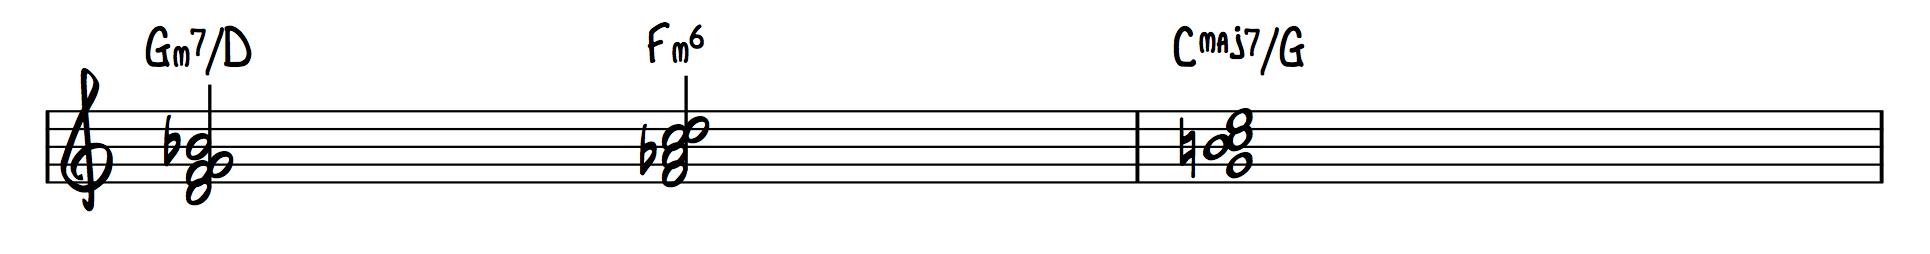 22 - 251 NH SUB